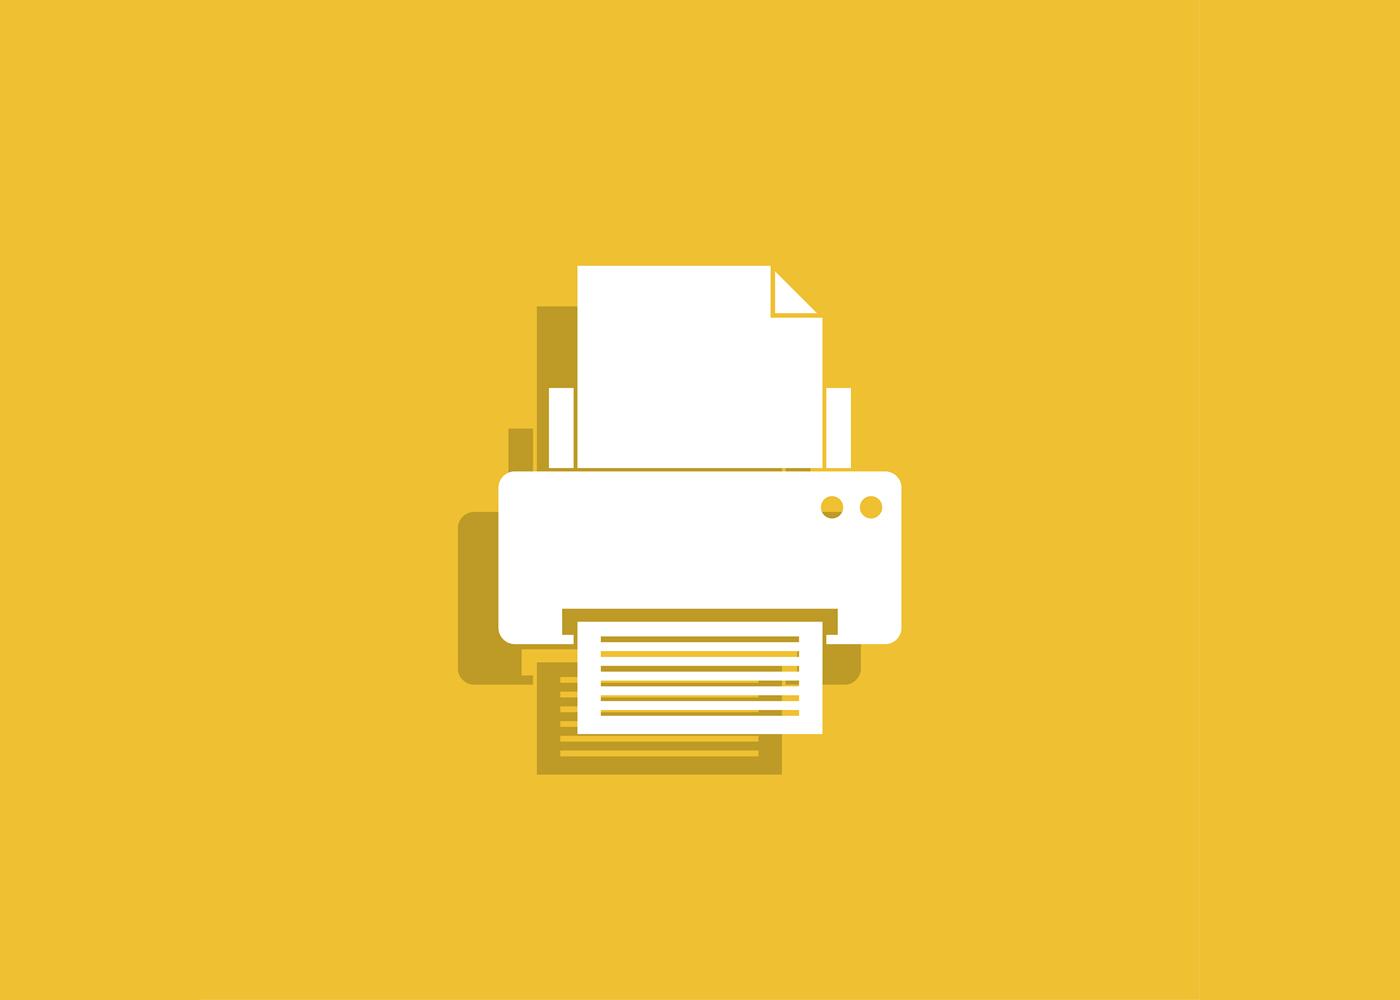 naem-research-quickpolls-2017-12-uv-technology-700x500